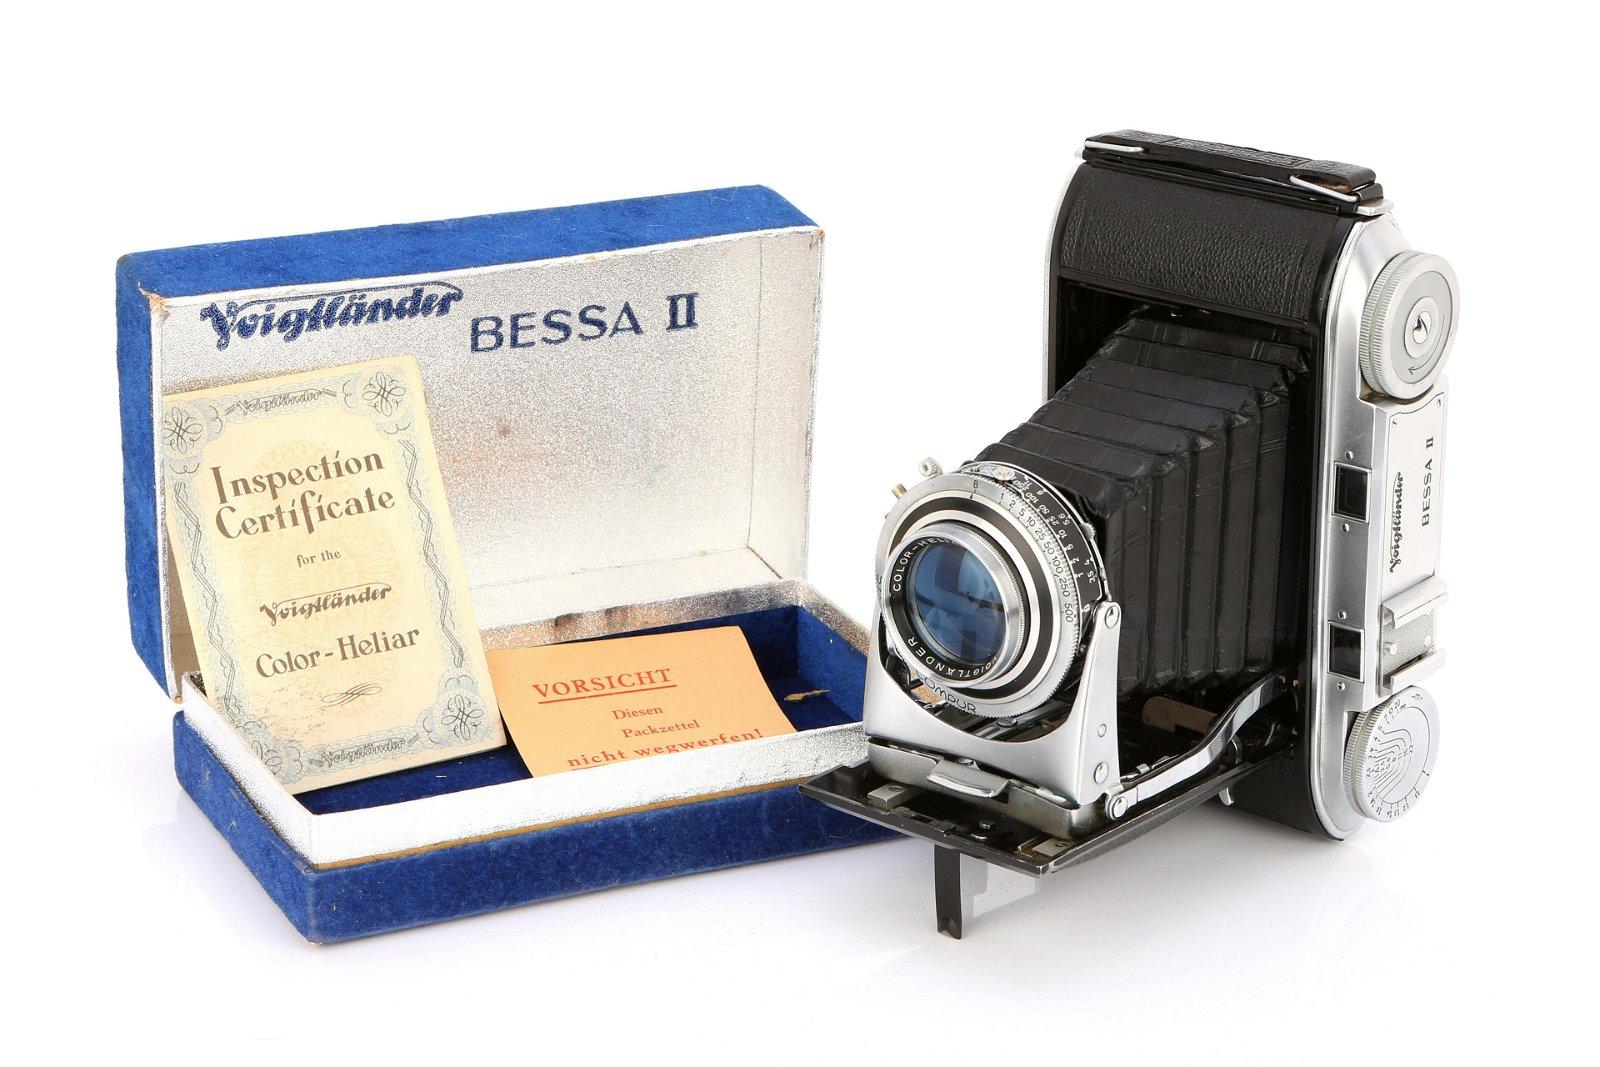 * A Voigtlander Bessa II Rangefinder Camera,